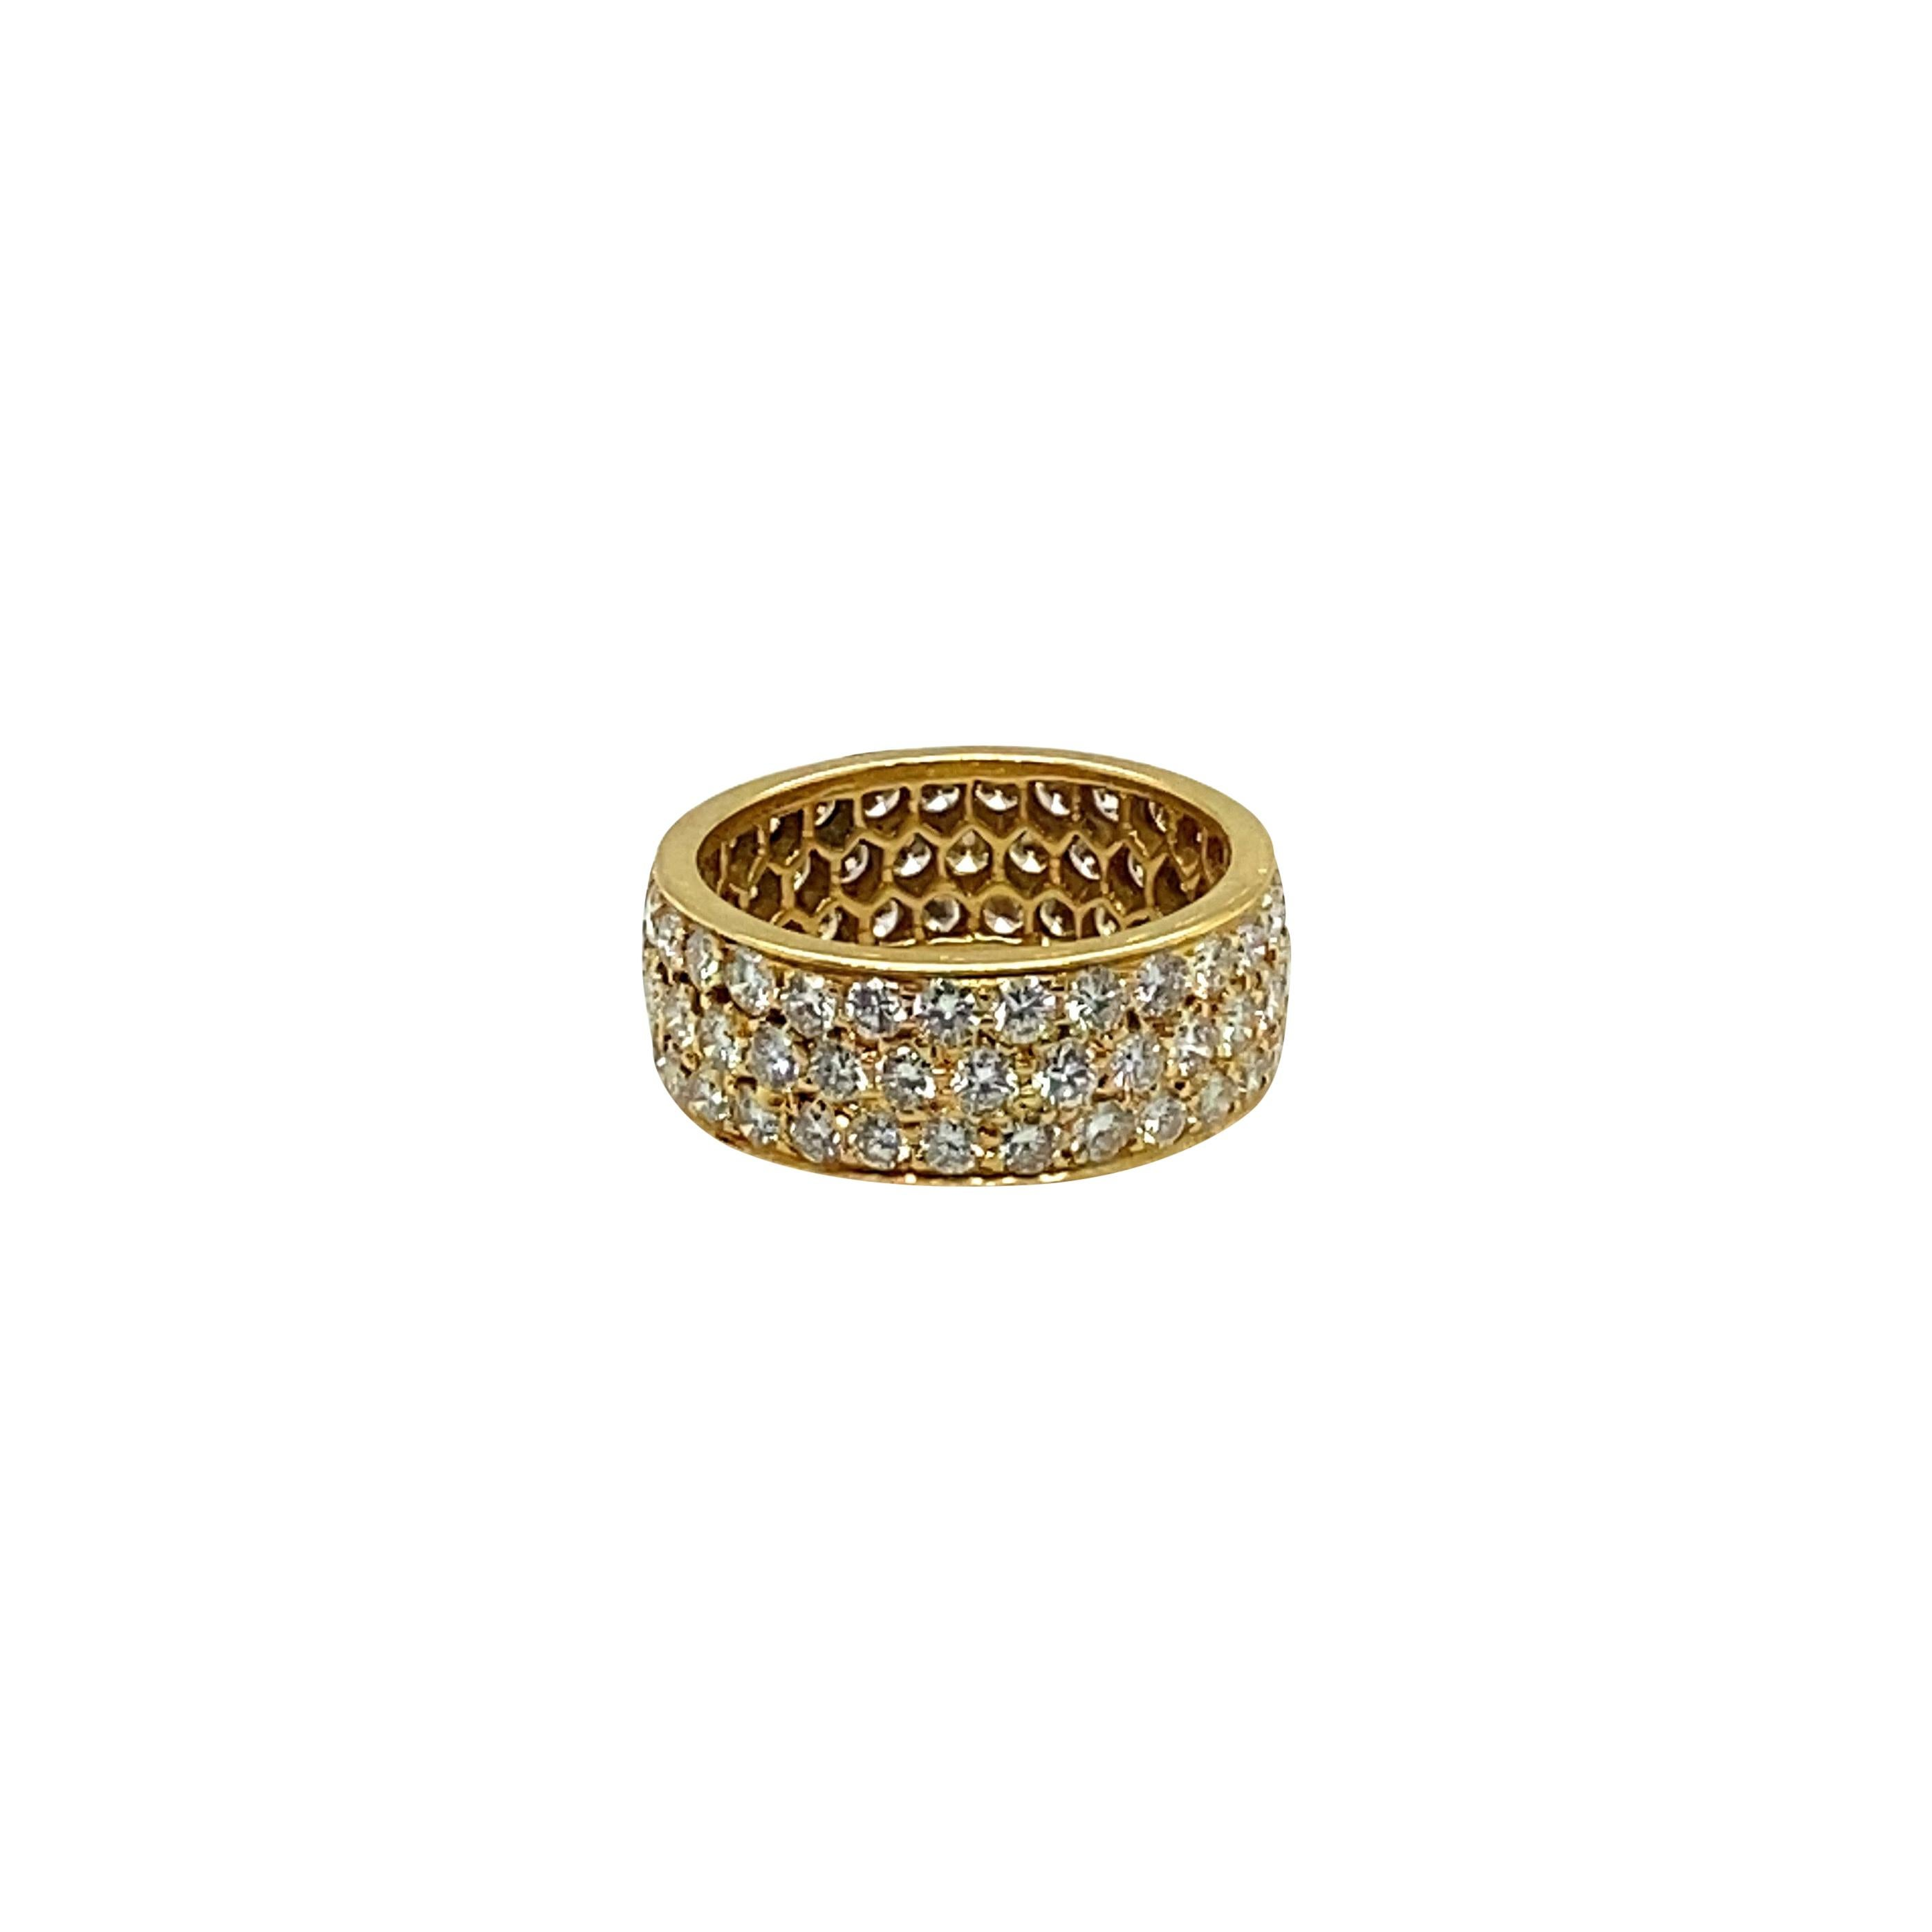 18k Yellow Gold Van Cleef & Arpels Diamond Ring